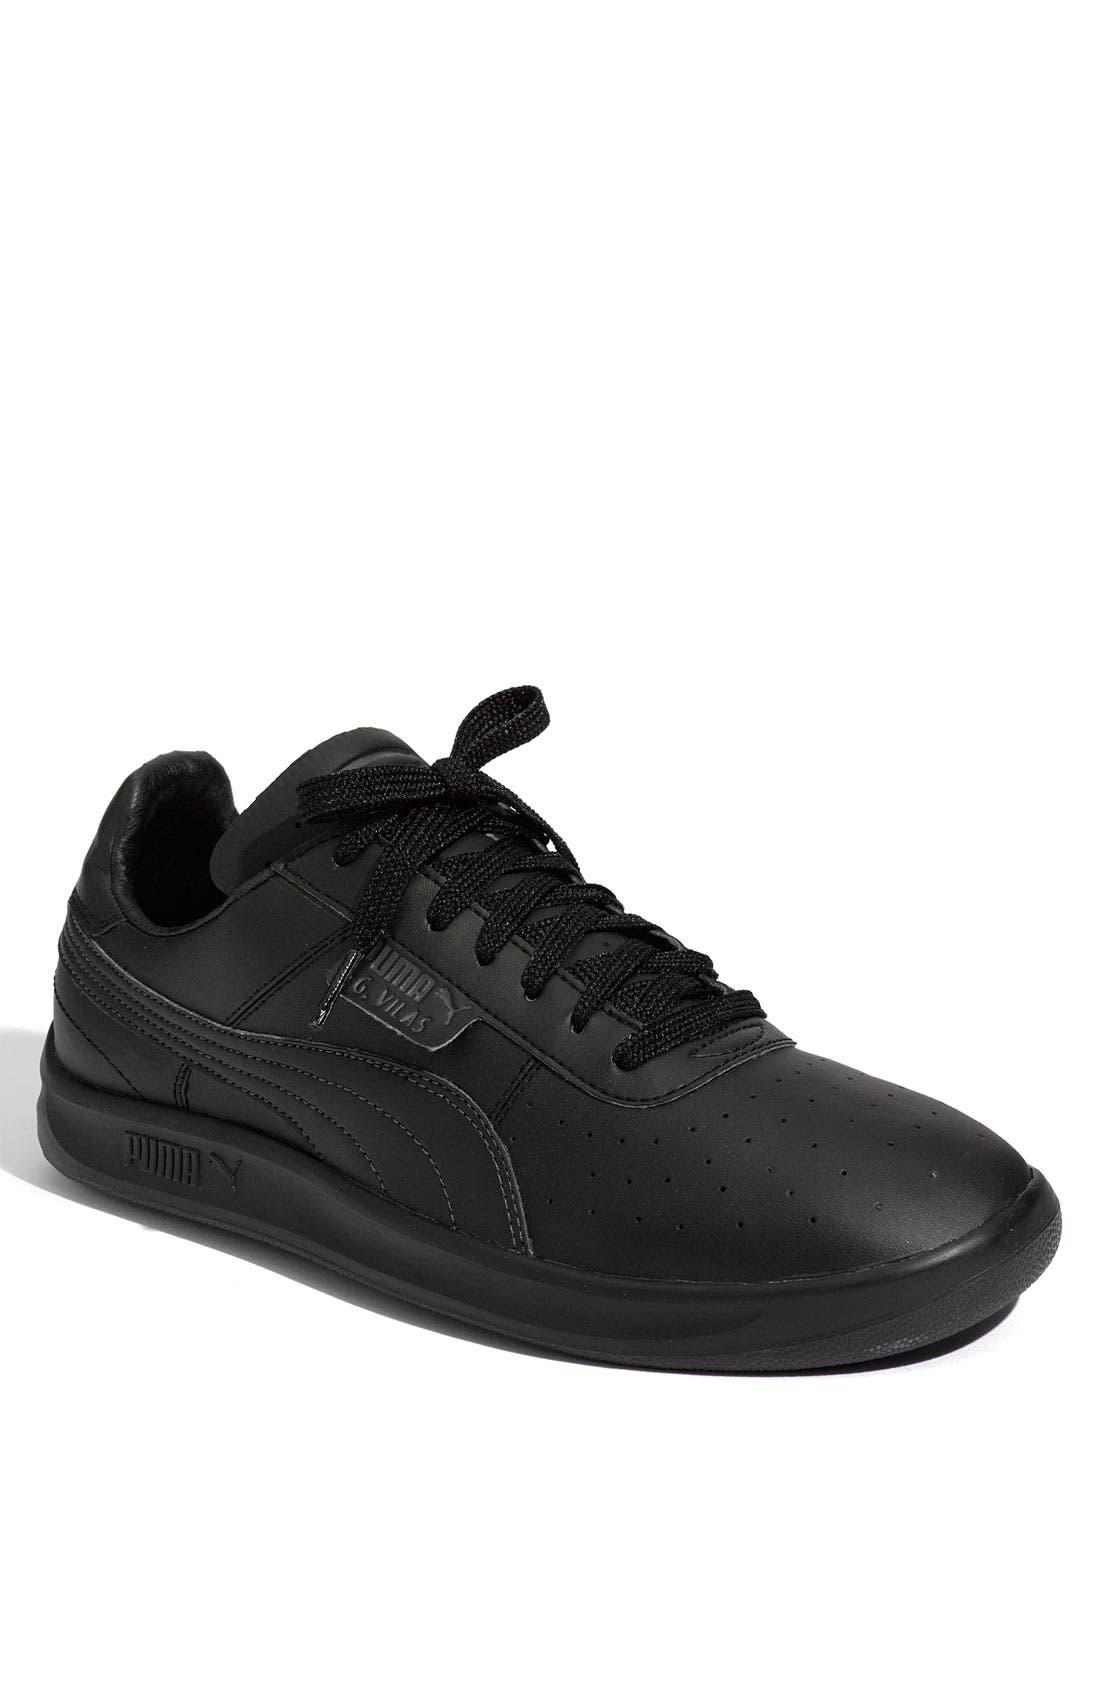 Main Image - Puma 'G. Vilas L2' Sneaker